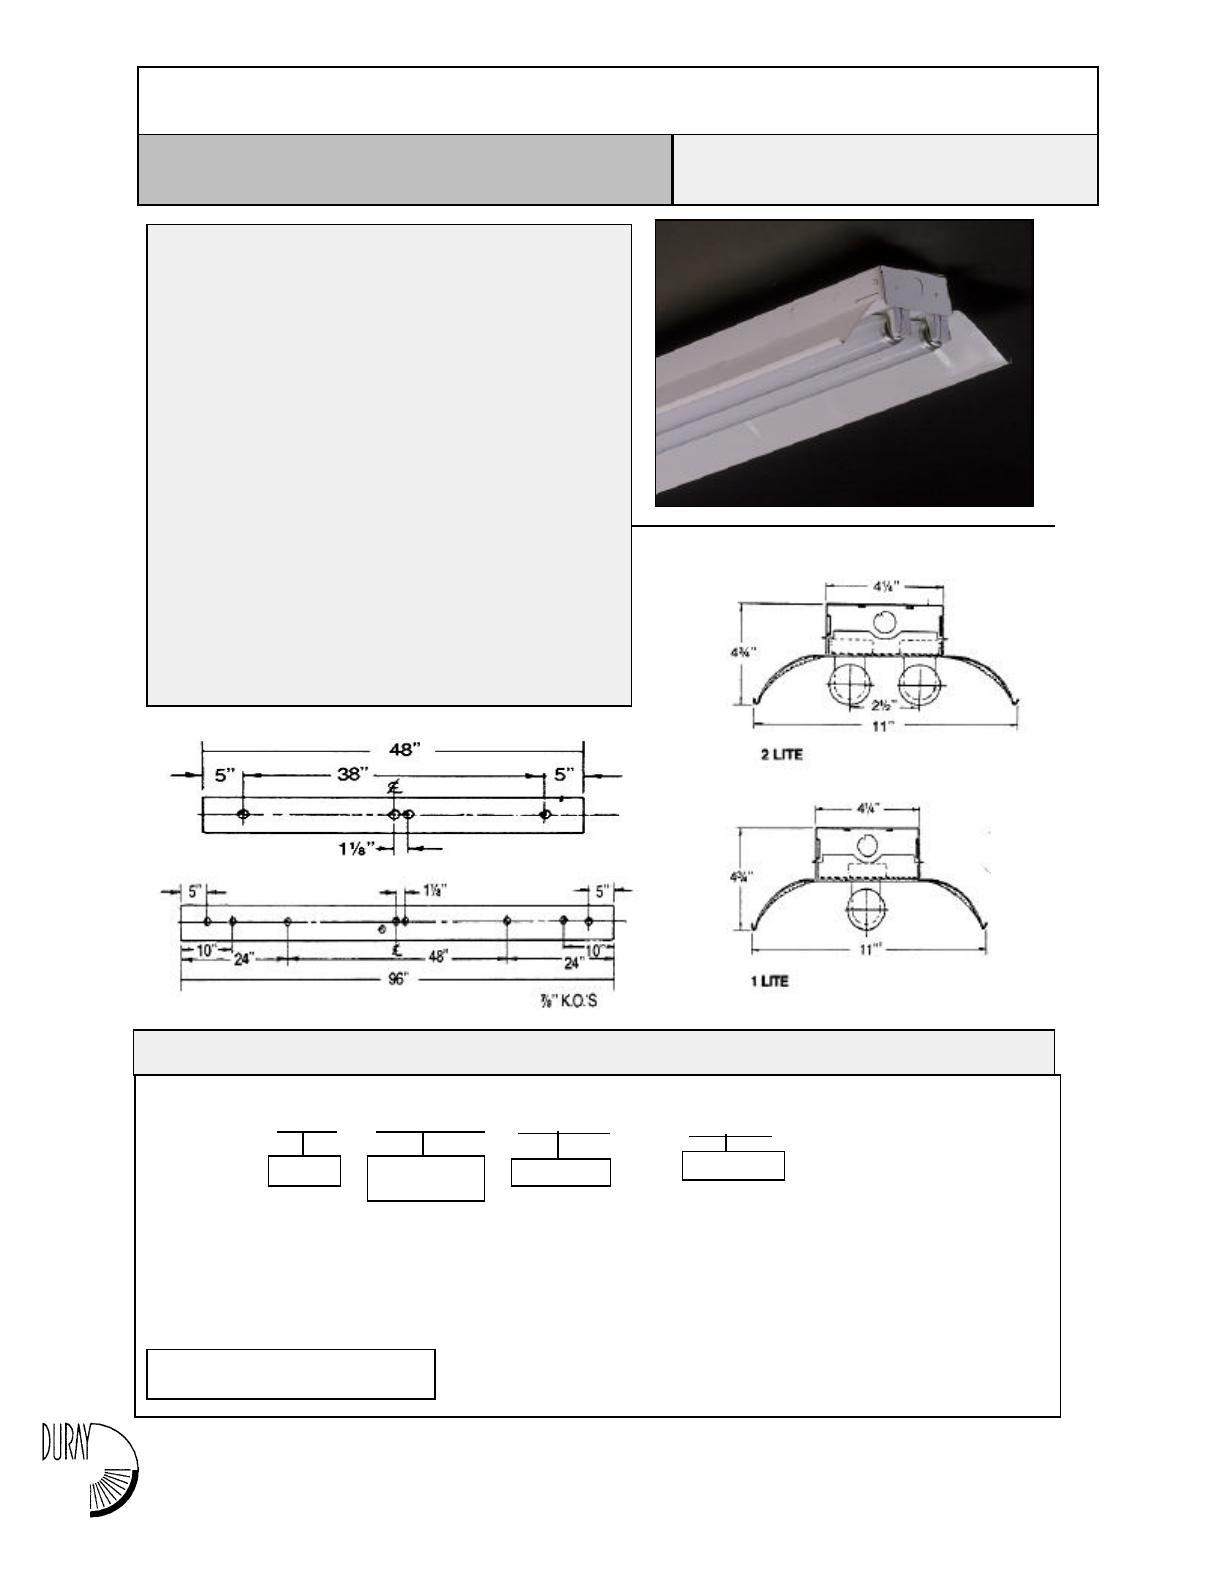 Uri A4 Vho Wiring Diagram